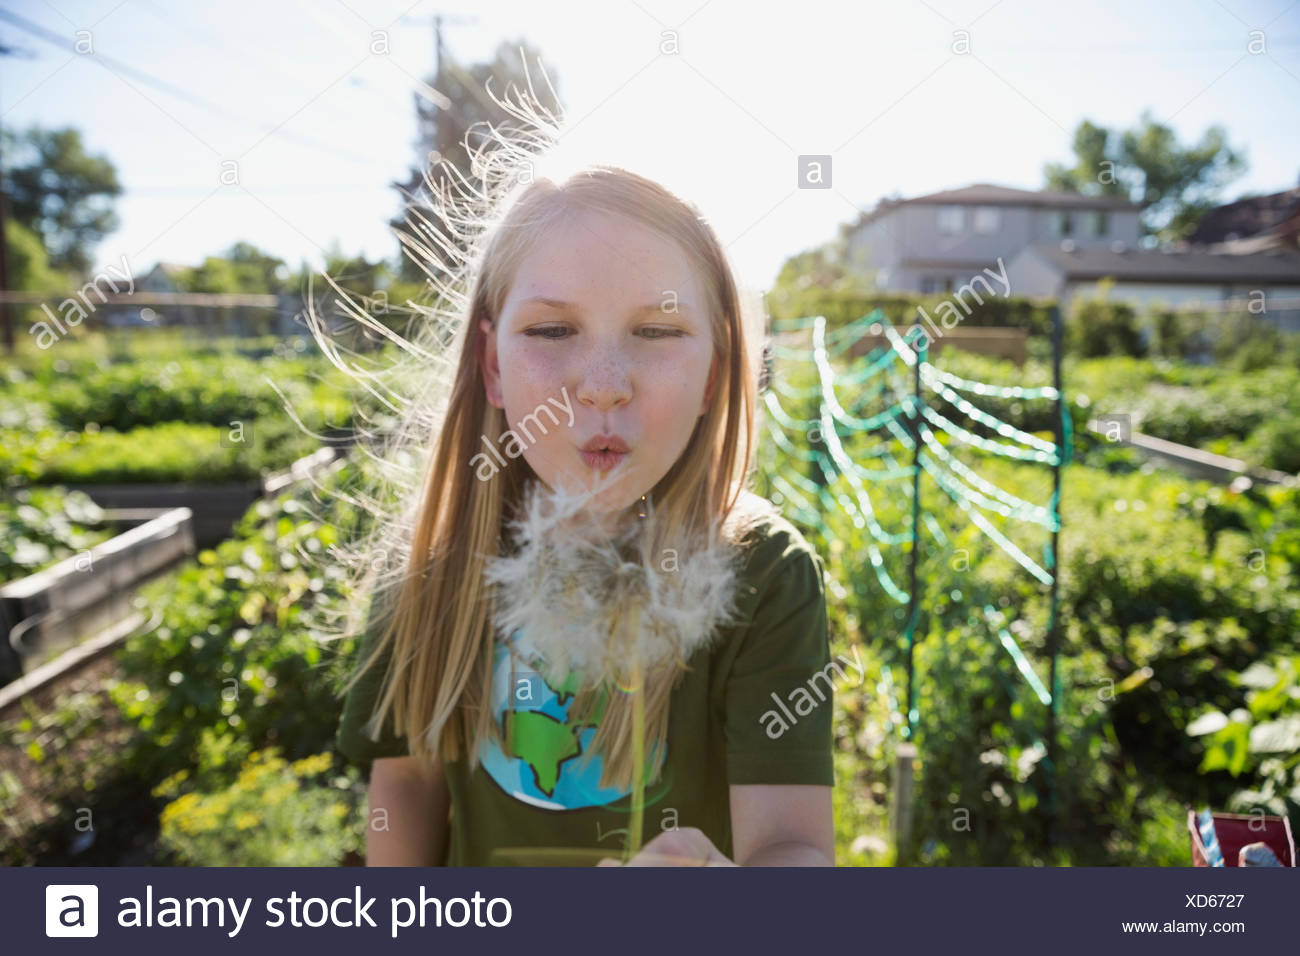 Girl blowing dandelion in sunny garden - Stock Image